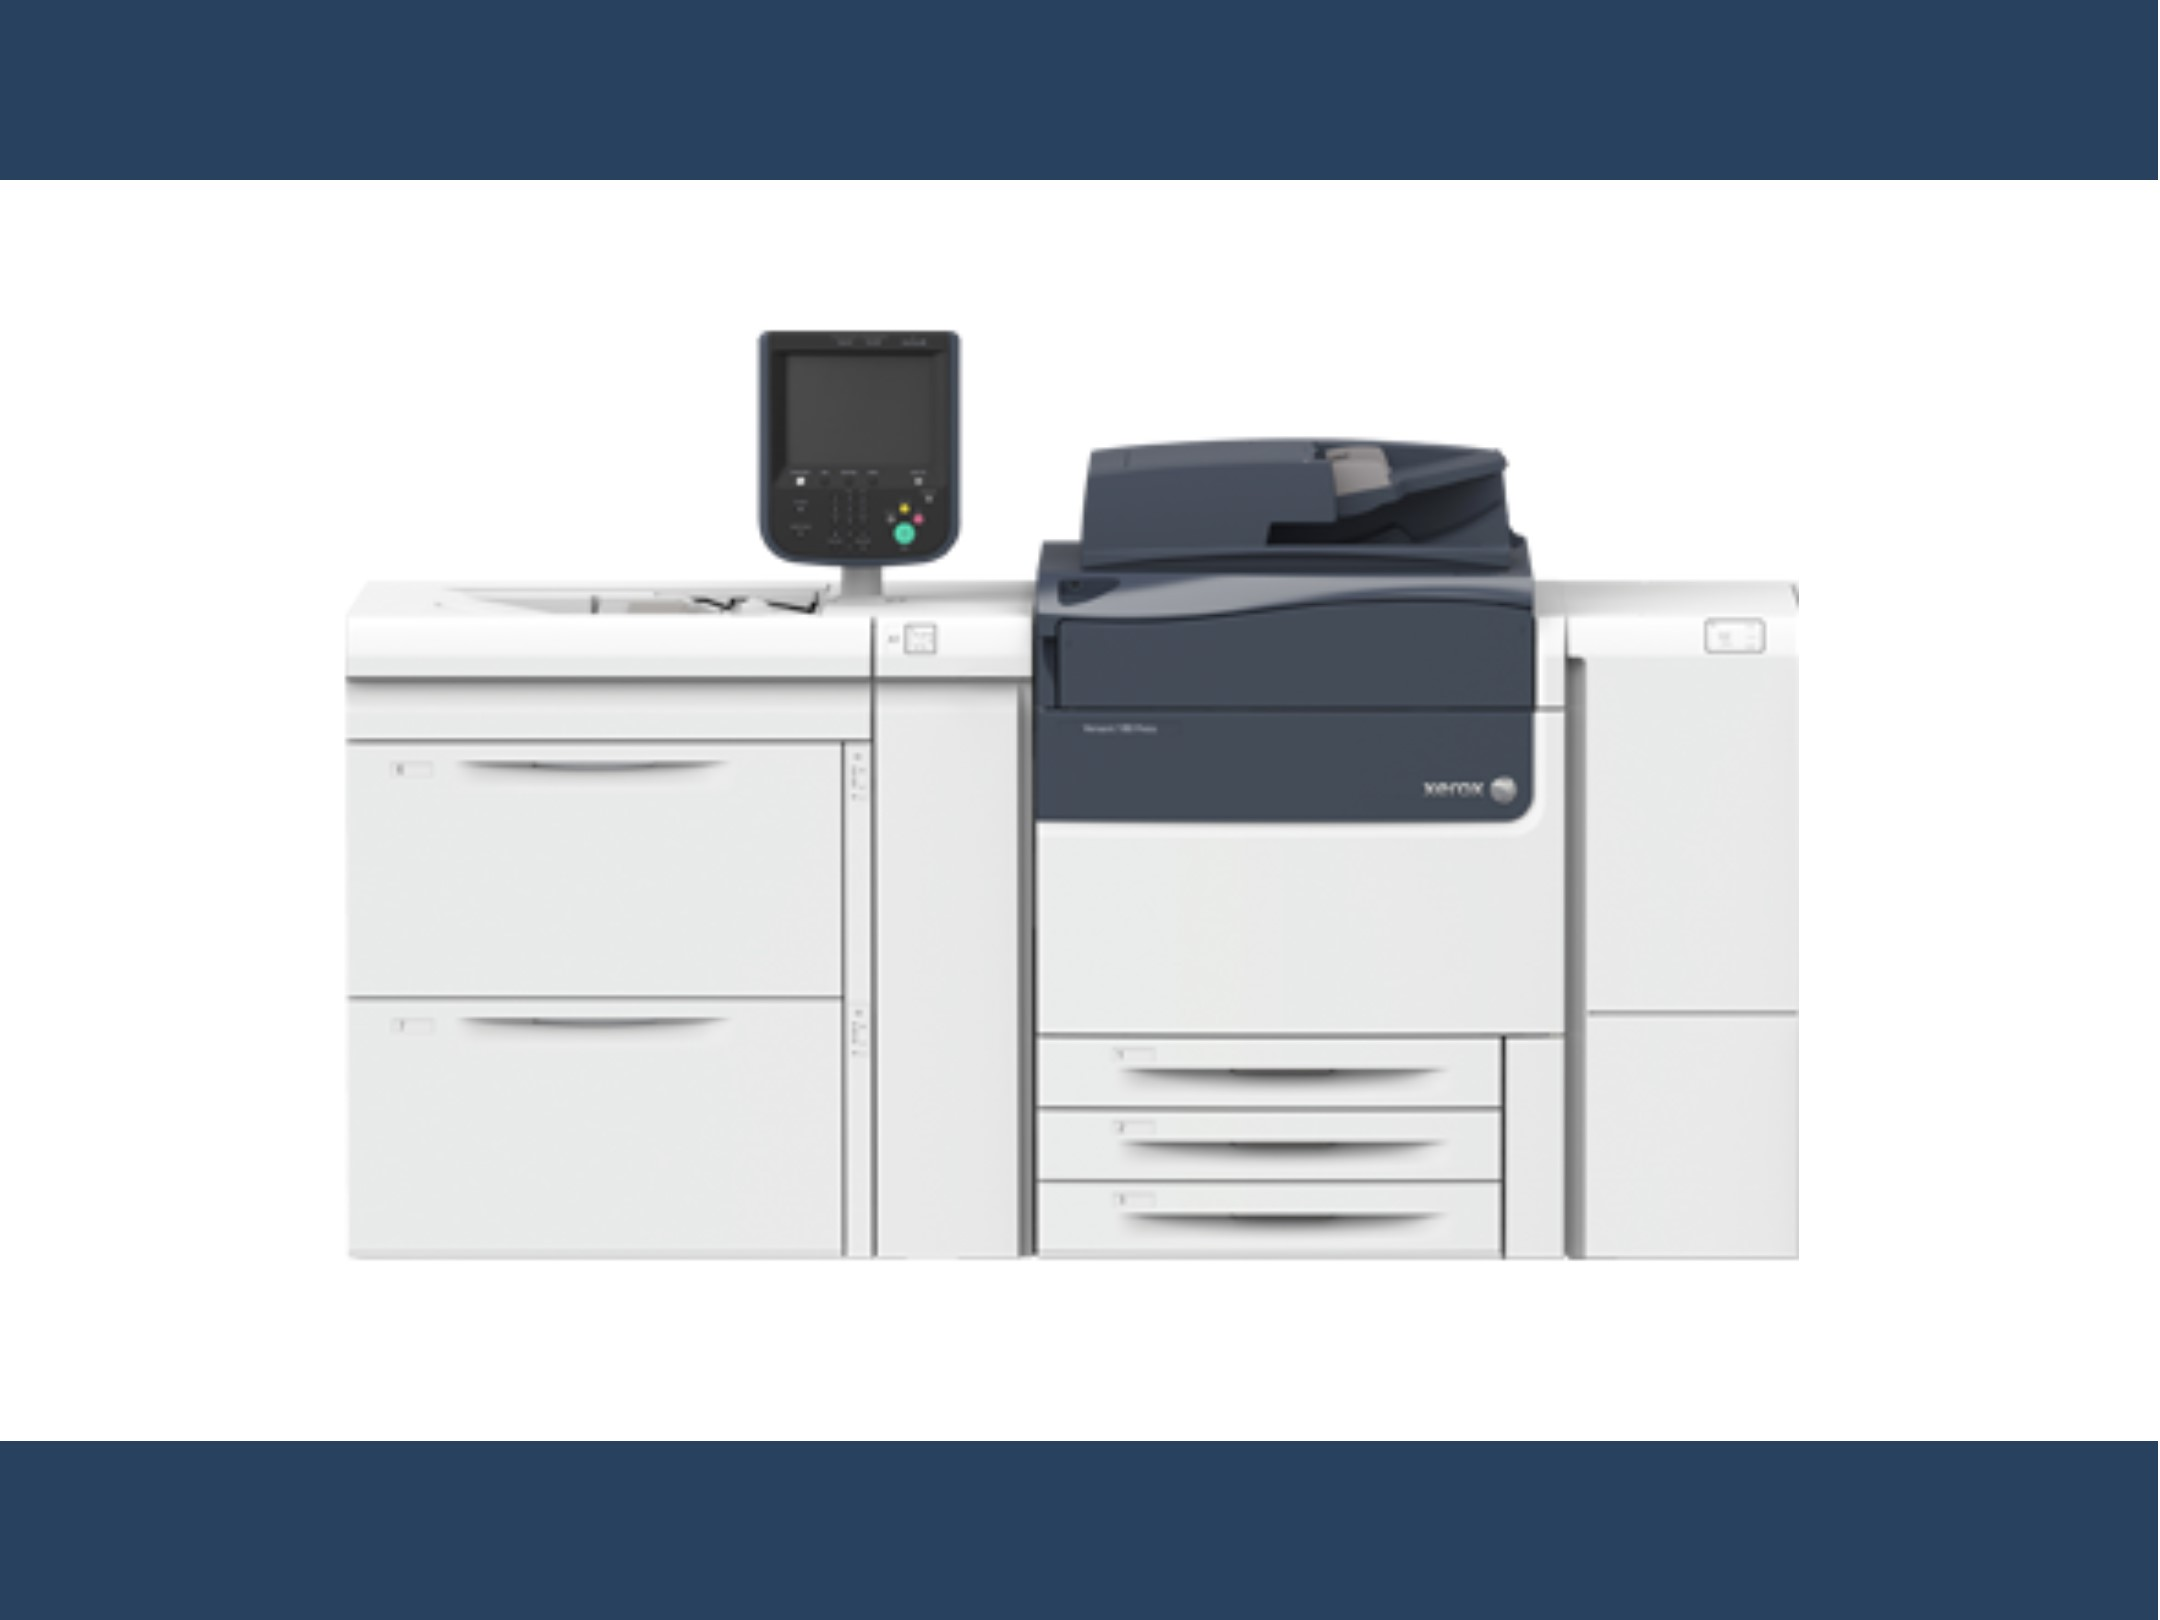 Introducing the New Xerox Versant 280 Press